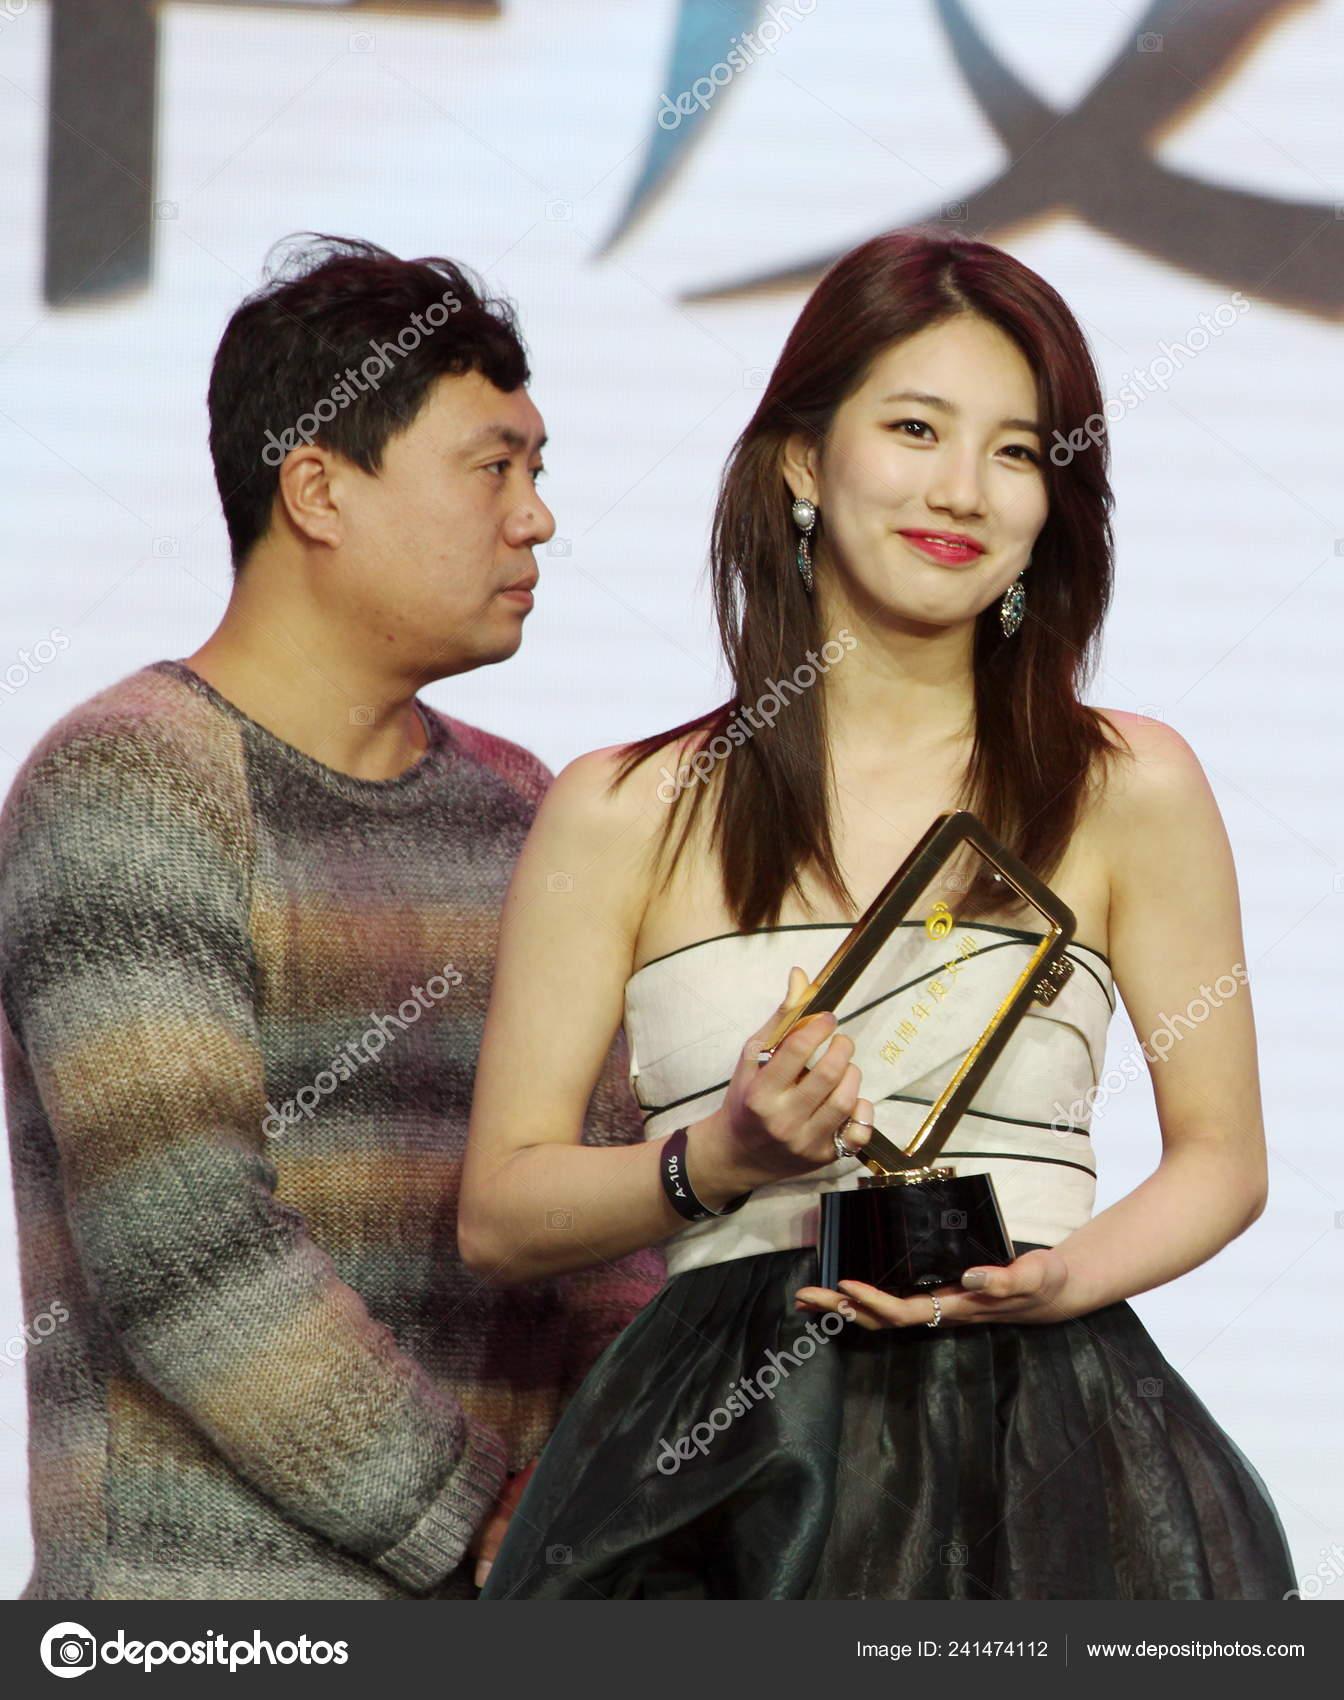 korejské celebrity z roku 2015